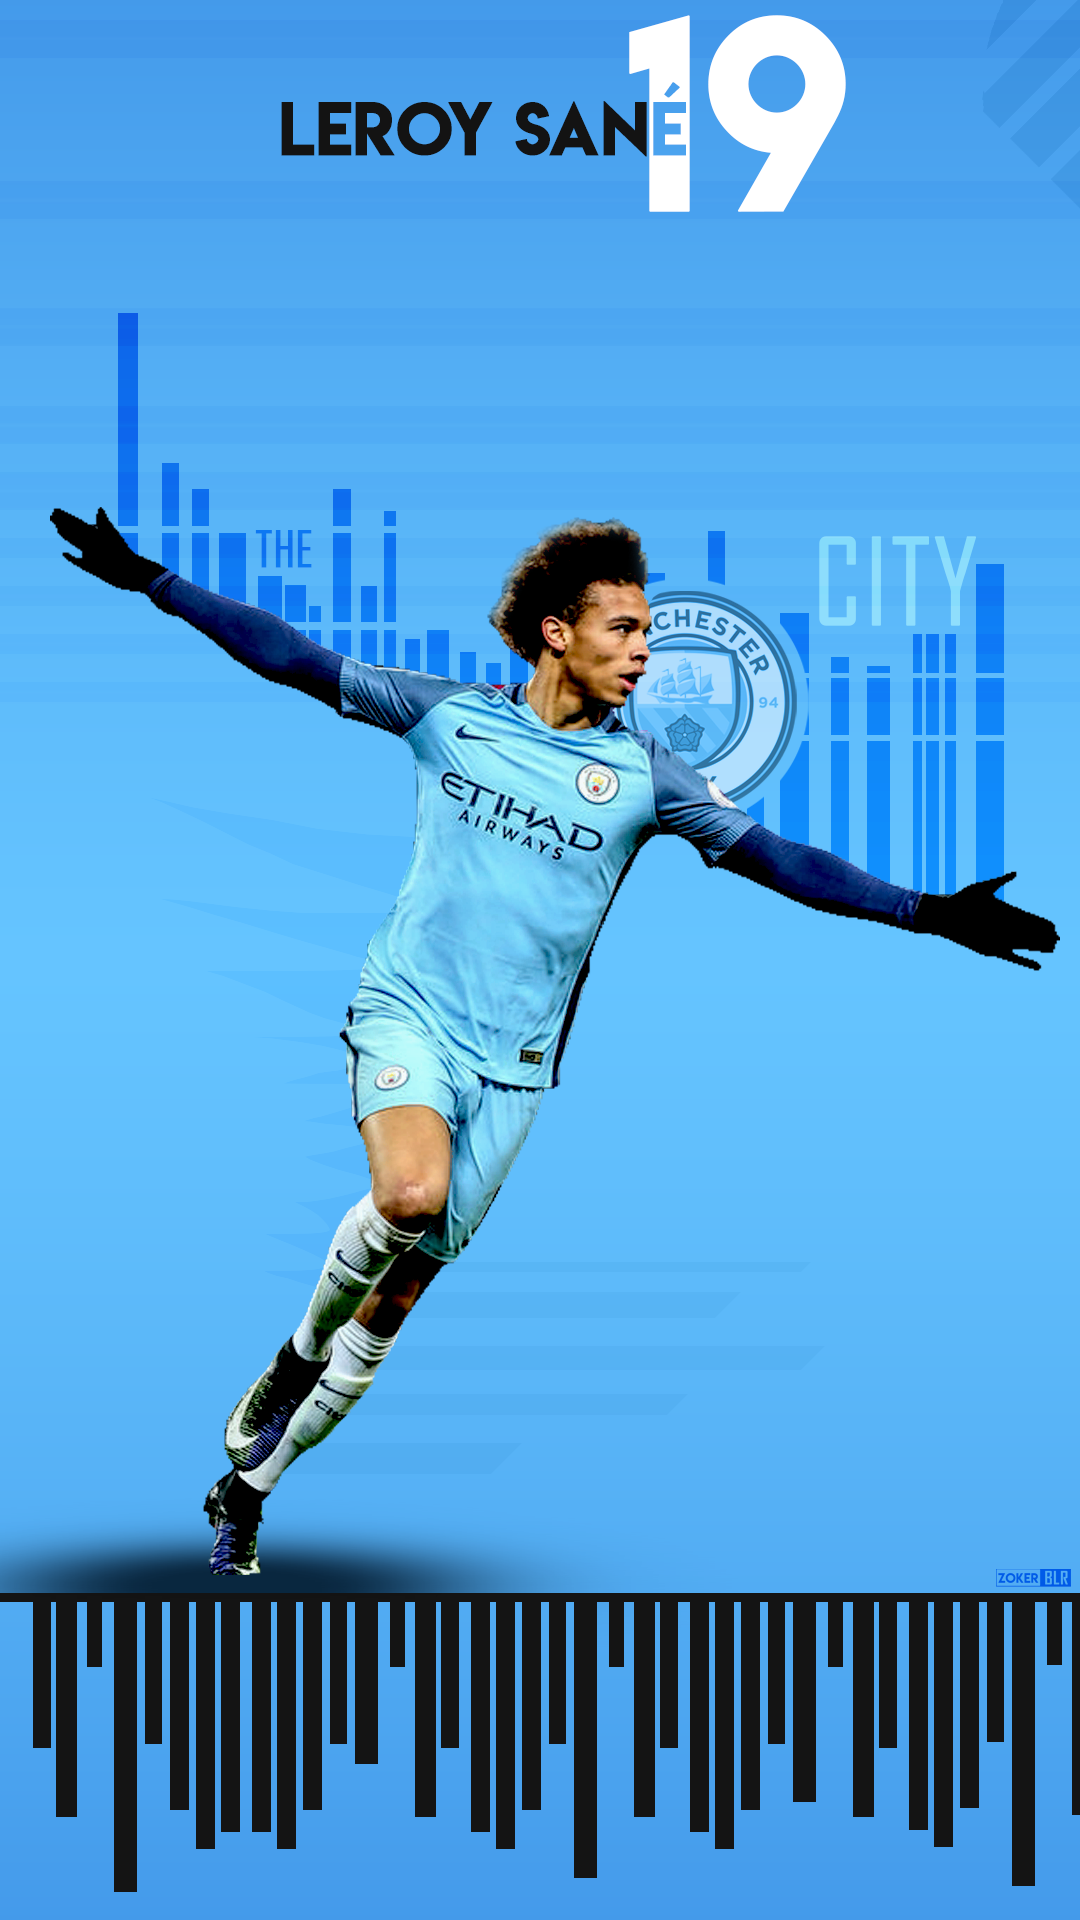 Leroy Sane Wallpaper Lockscreen By Zokerblr Manchester City Football Club Manchester City Leroy Sane